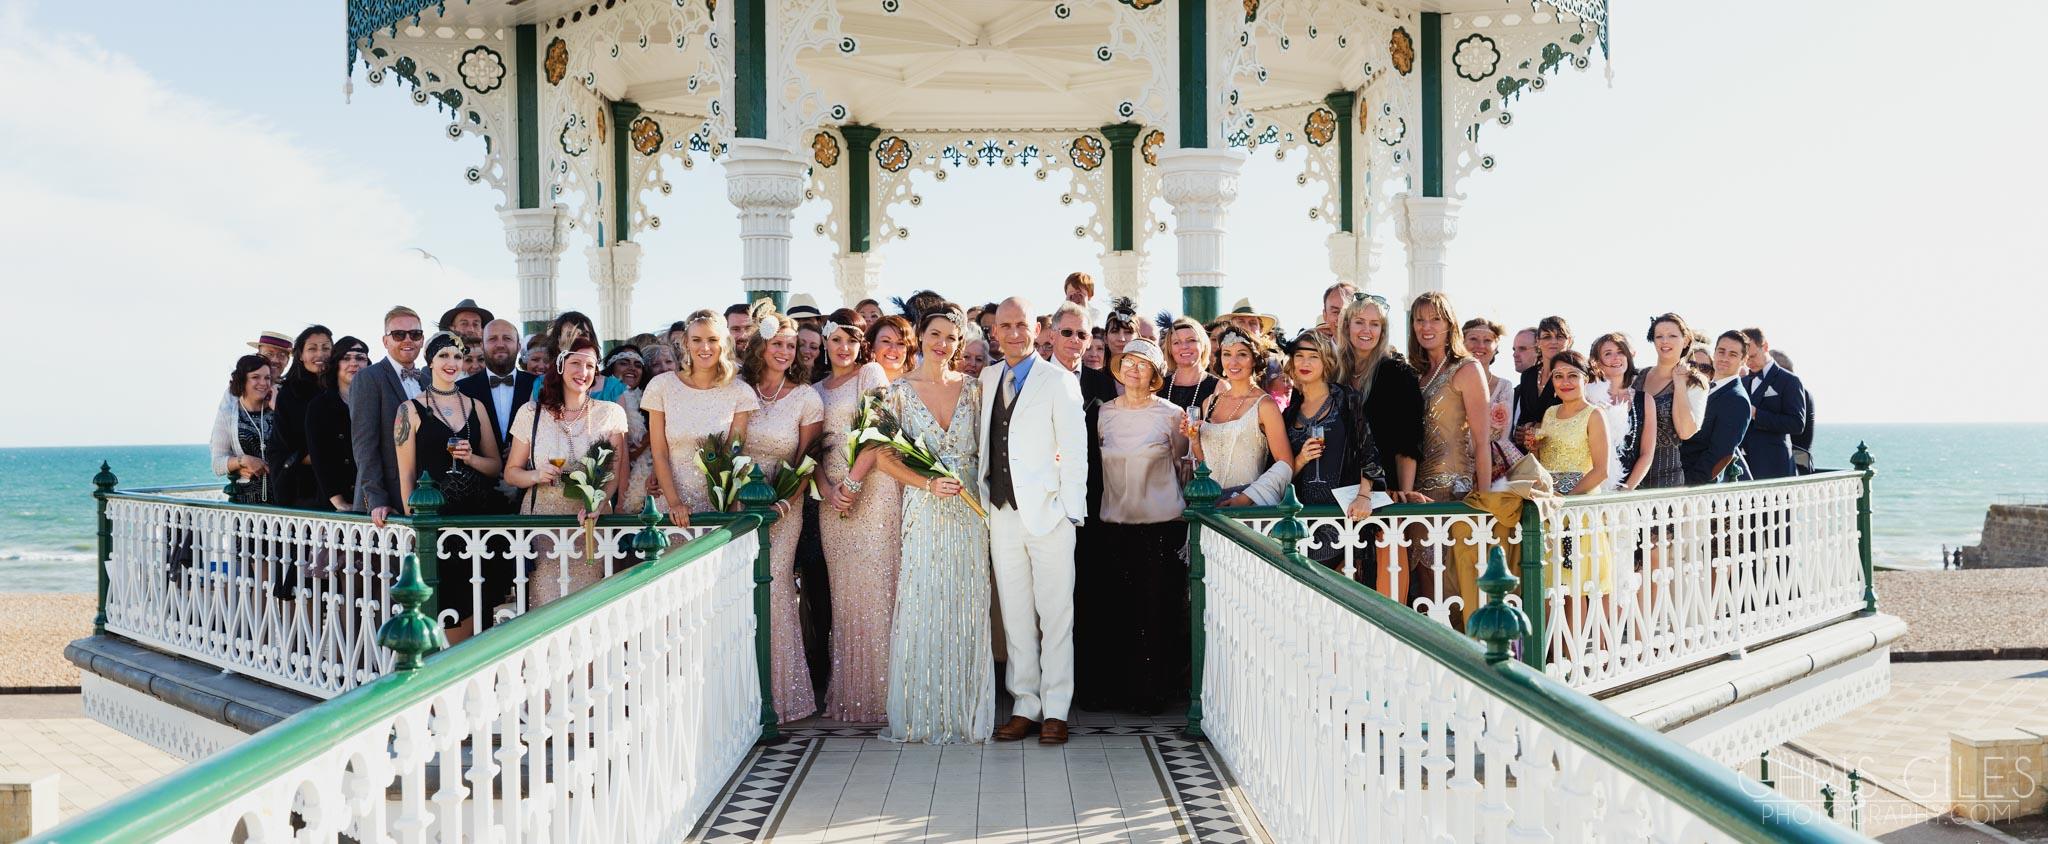 1920s-brighton-wedding-30